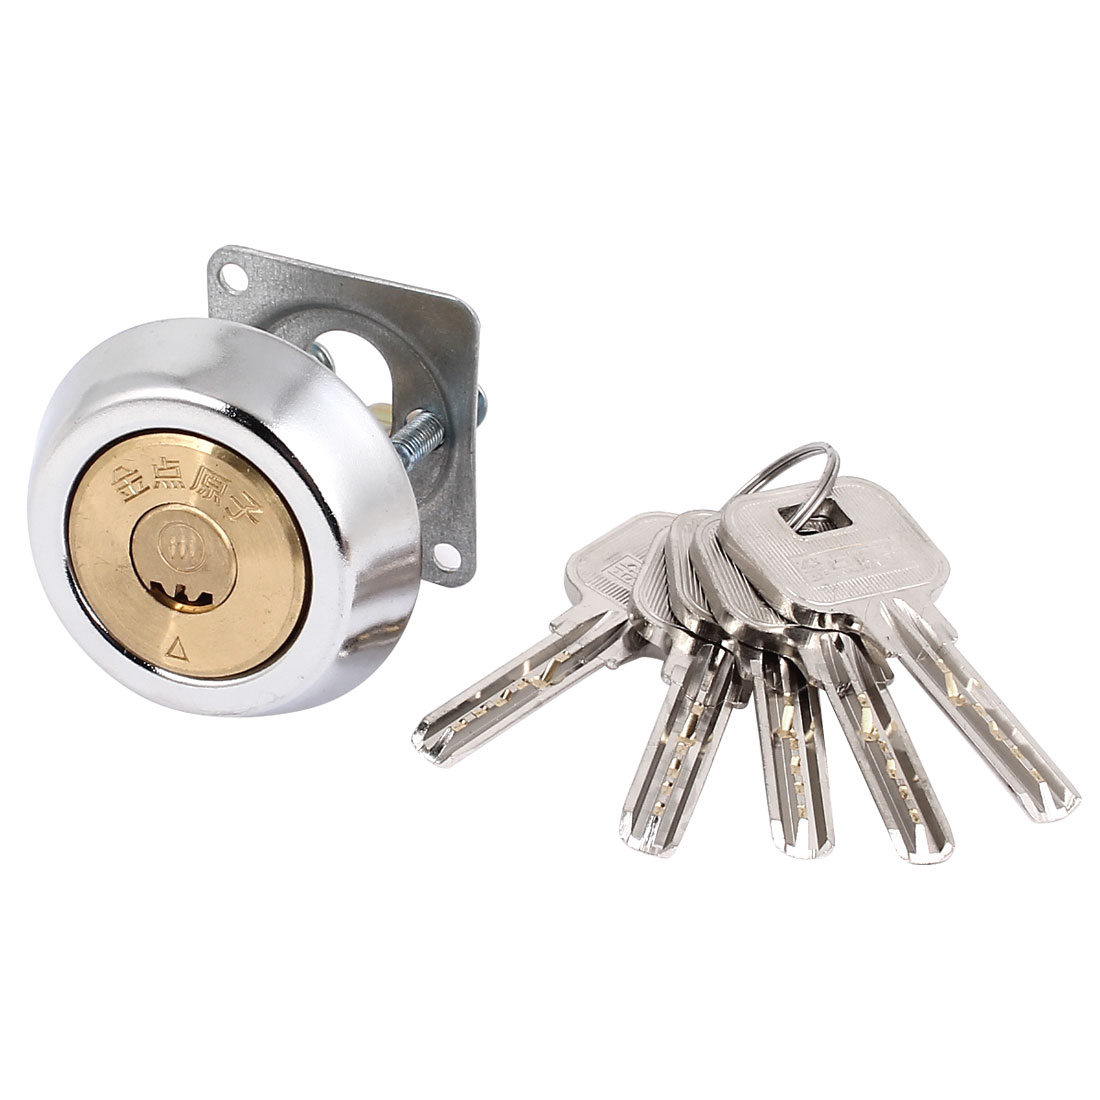 Screw Mounted Deadbolt Drawer Door Cylinder Security Lock + 5 Keys